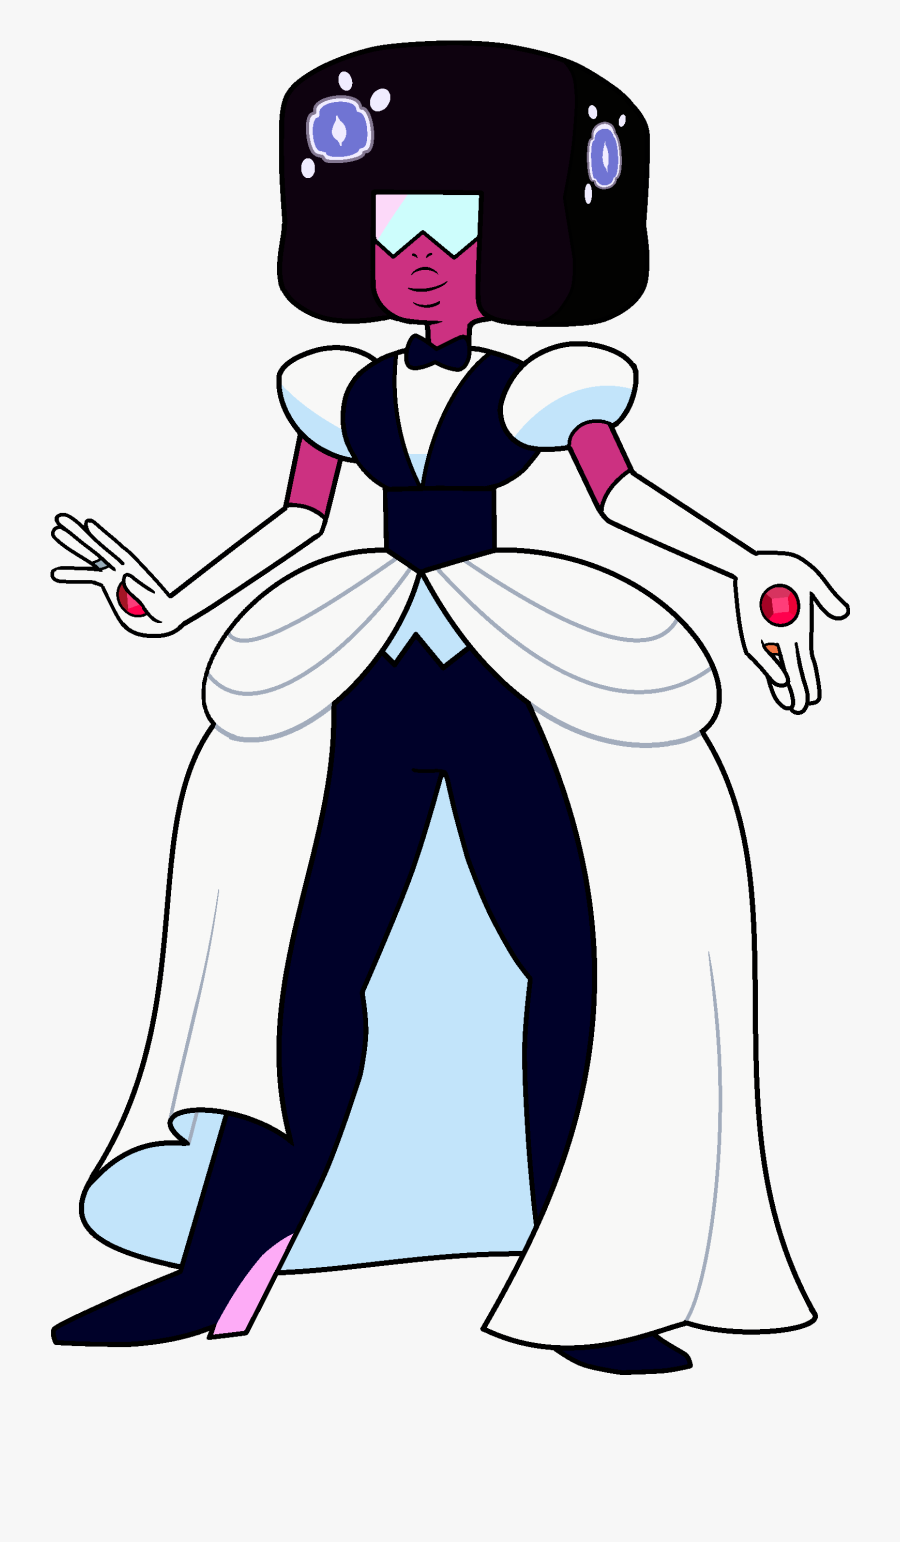 Image Garnet Wedding Outfit - Garnet Steven Universe Wedding, Transparent Clipart